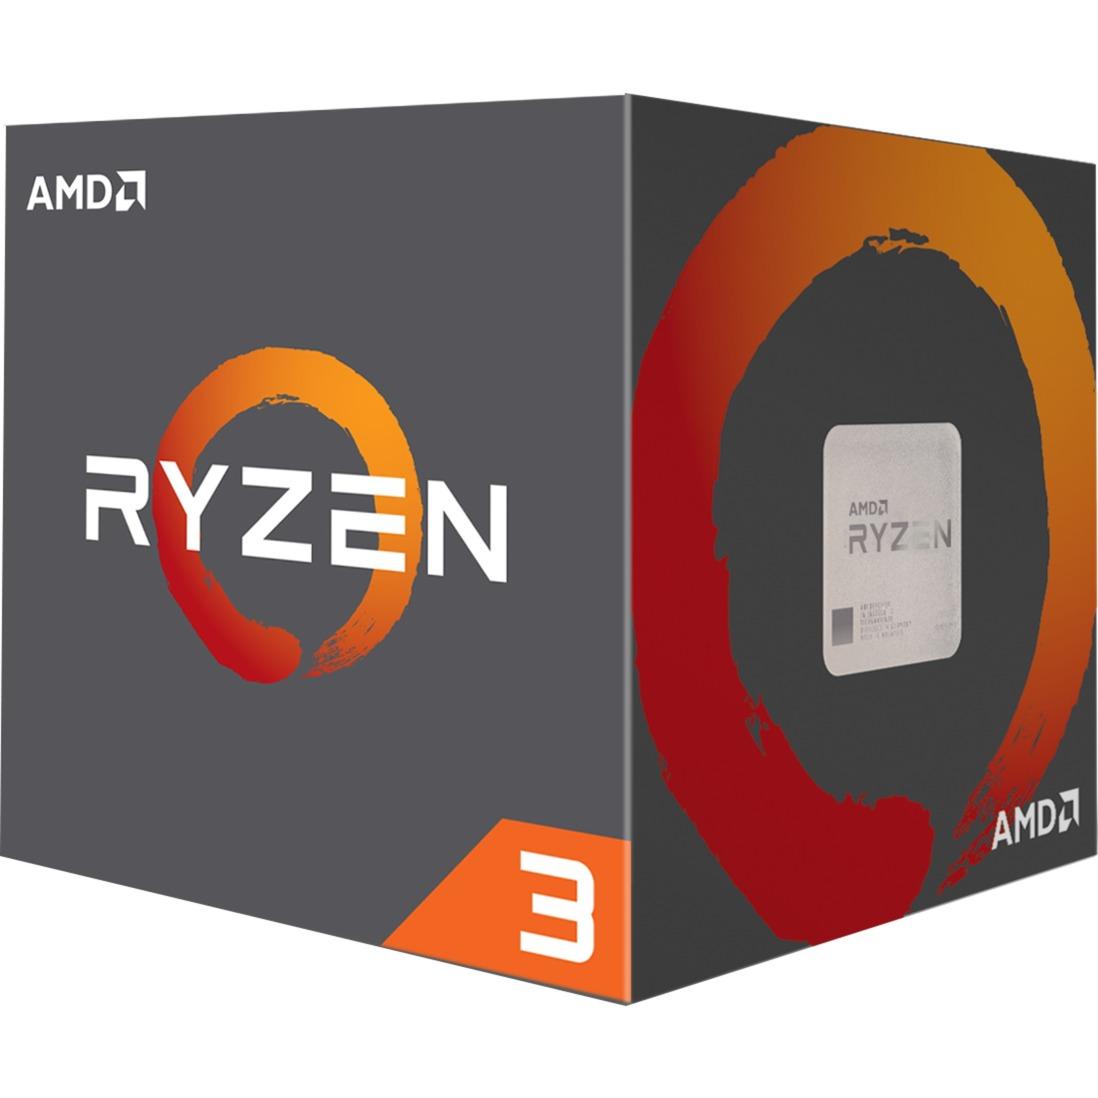 Ryzen 3 1300X 3.5GHz 8MB L3 Caja procesador